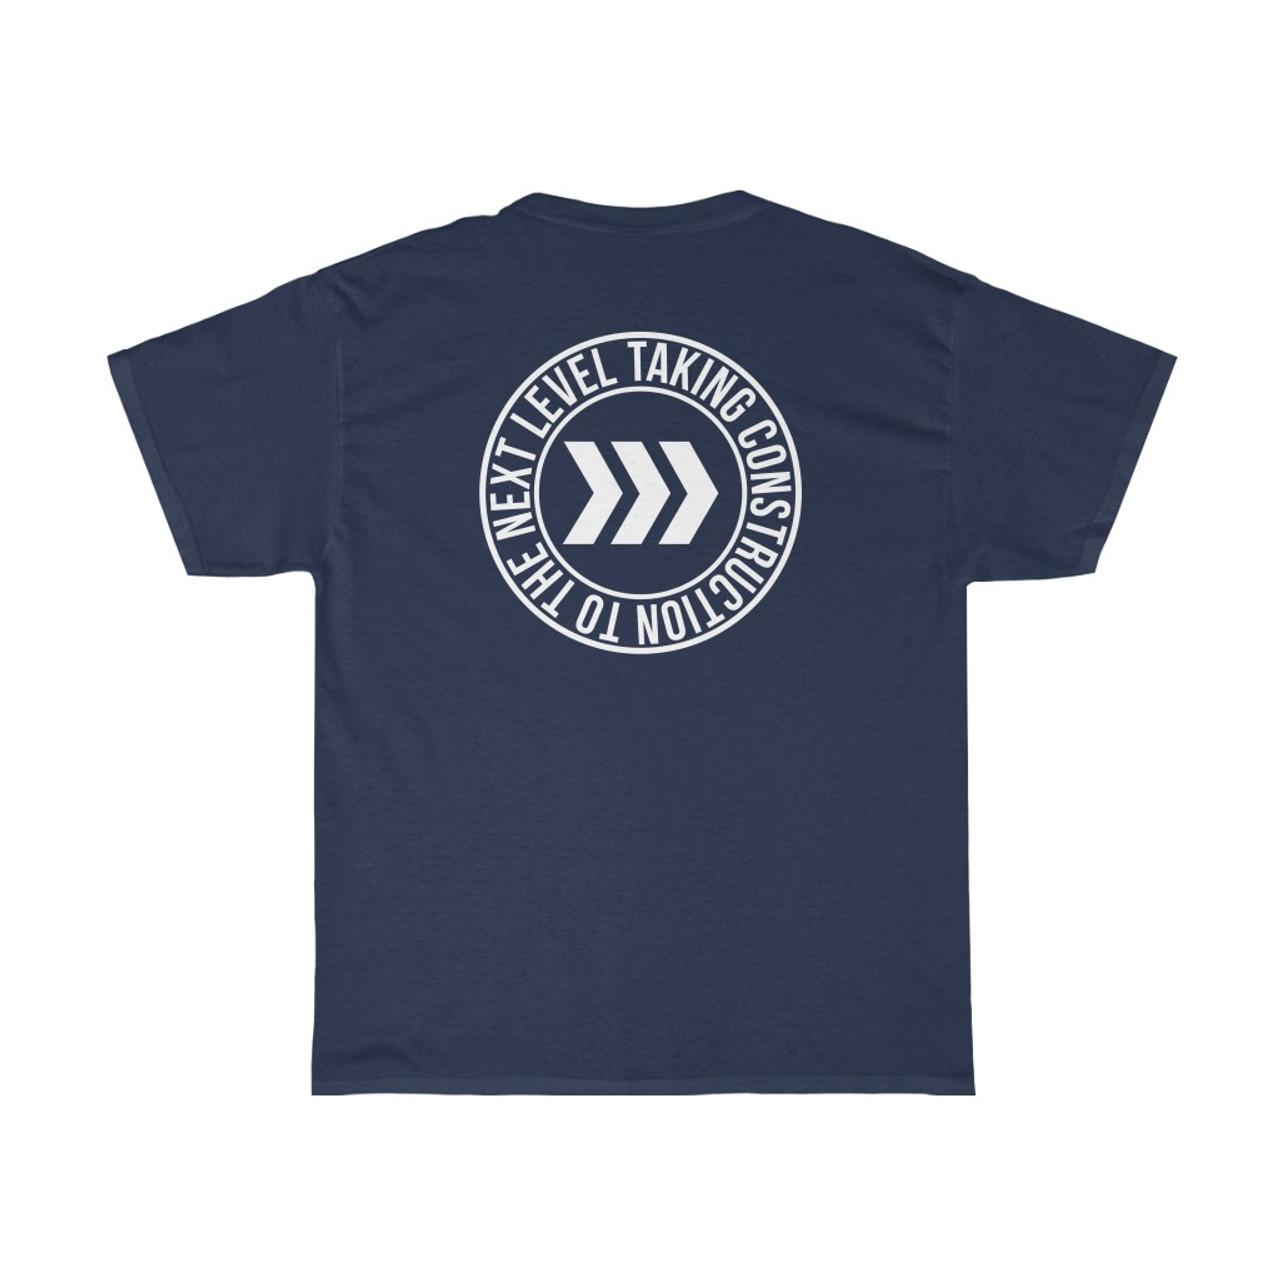 "Unisex Navy Blue ""Logo/Circle"" Cotton Tee"